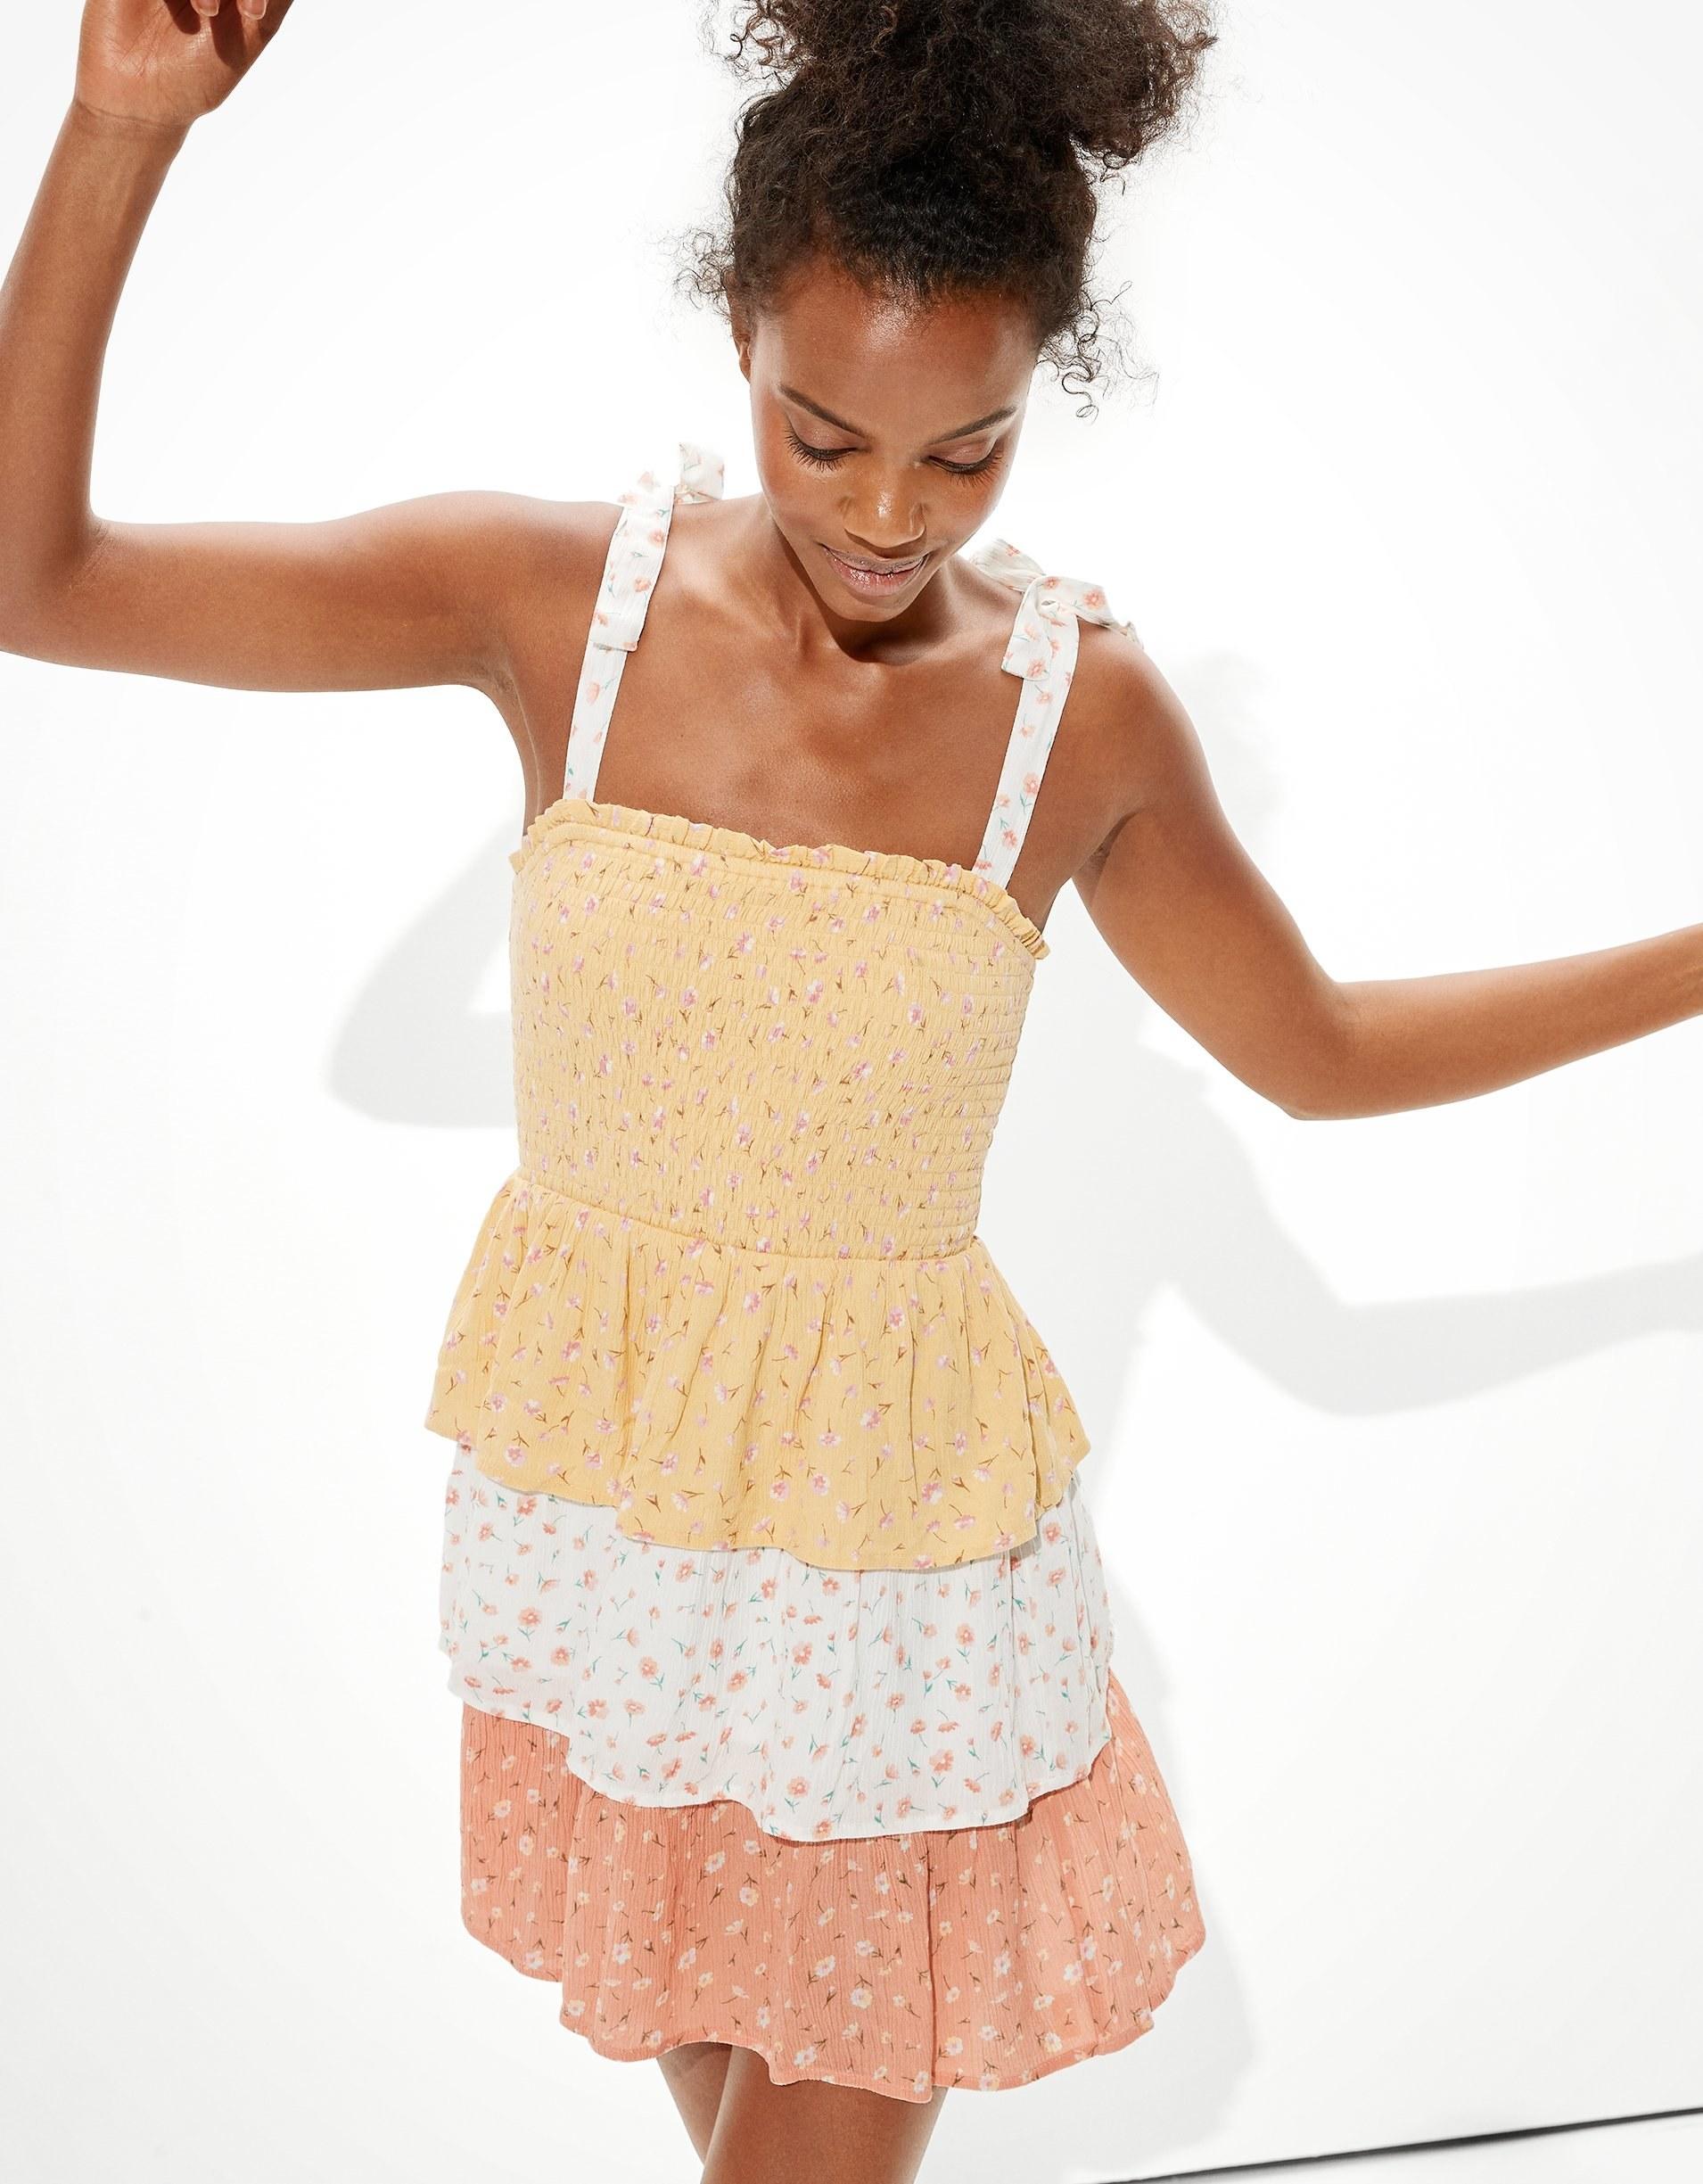 A model twirling in the dress